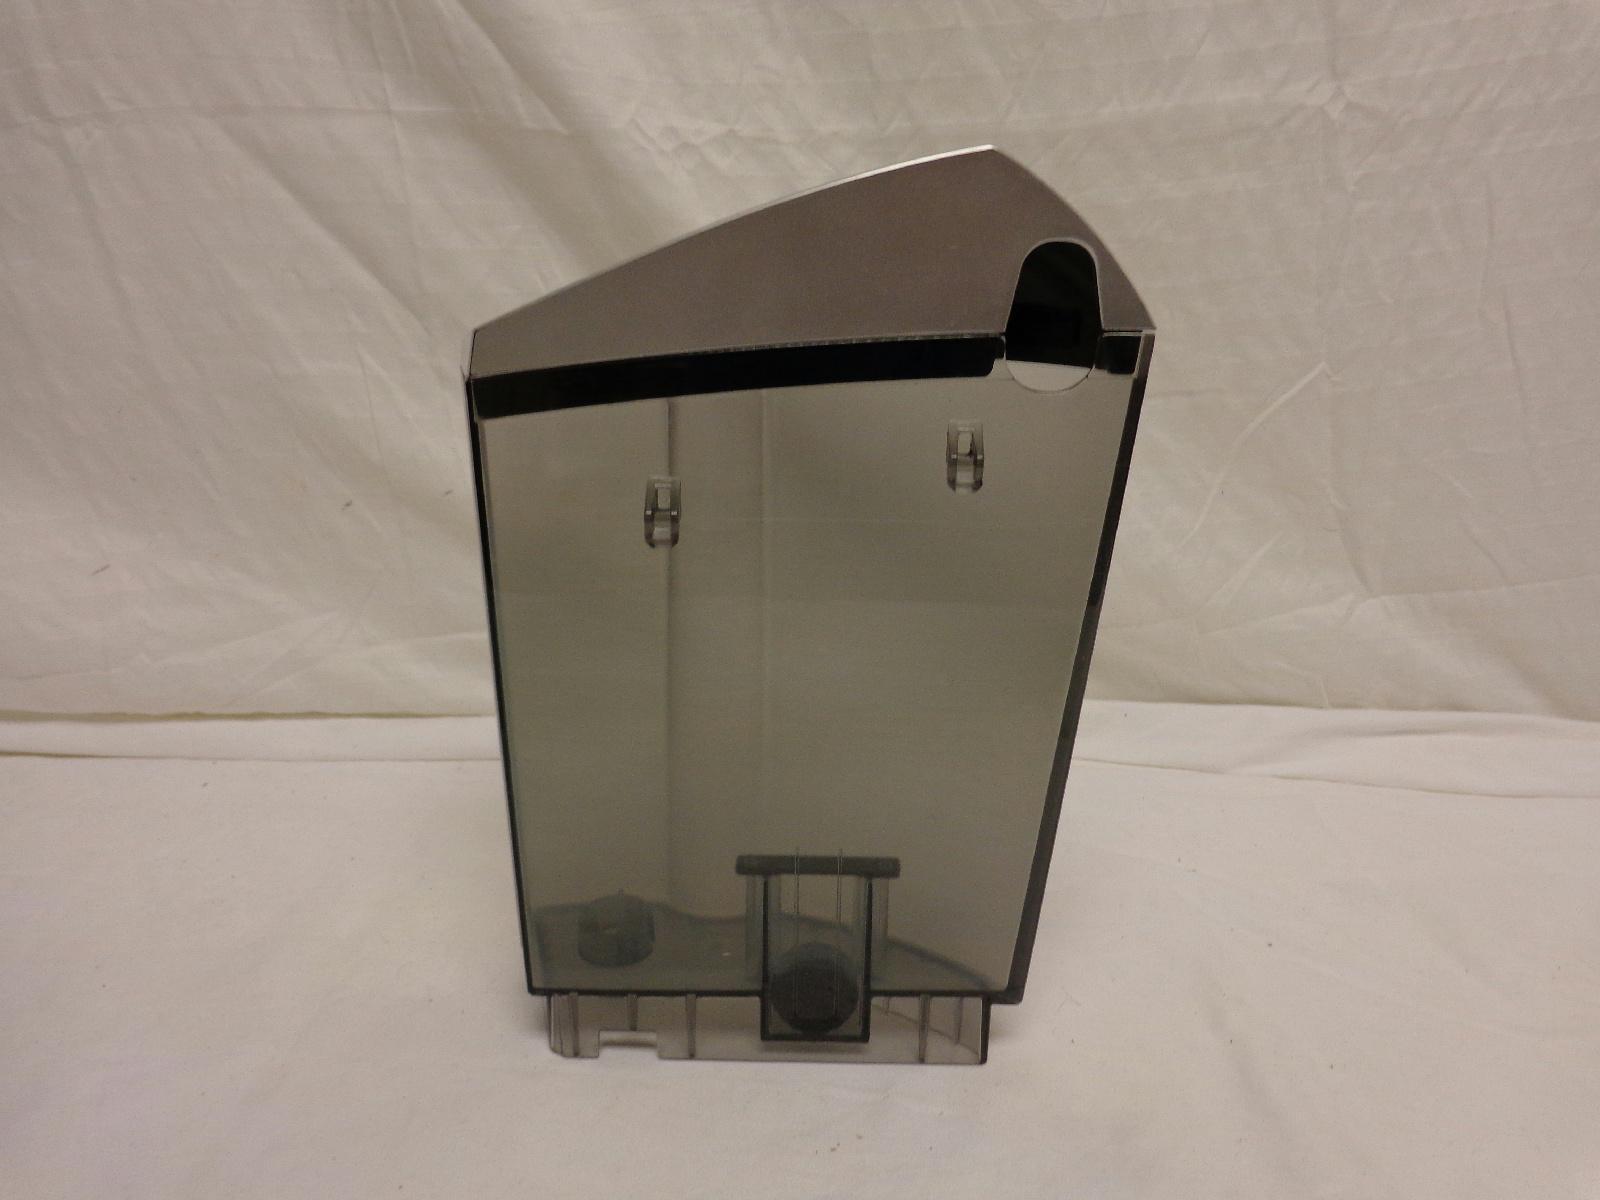 Keurig Replacement Water Reservoir Tank for B60 Coffee Maker eBay